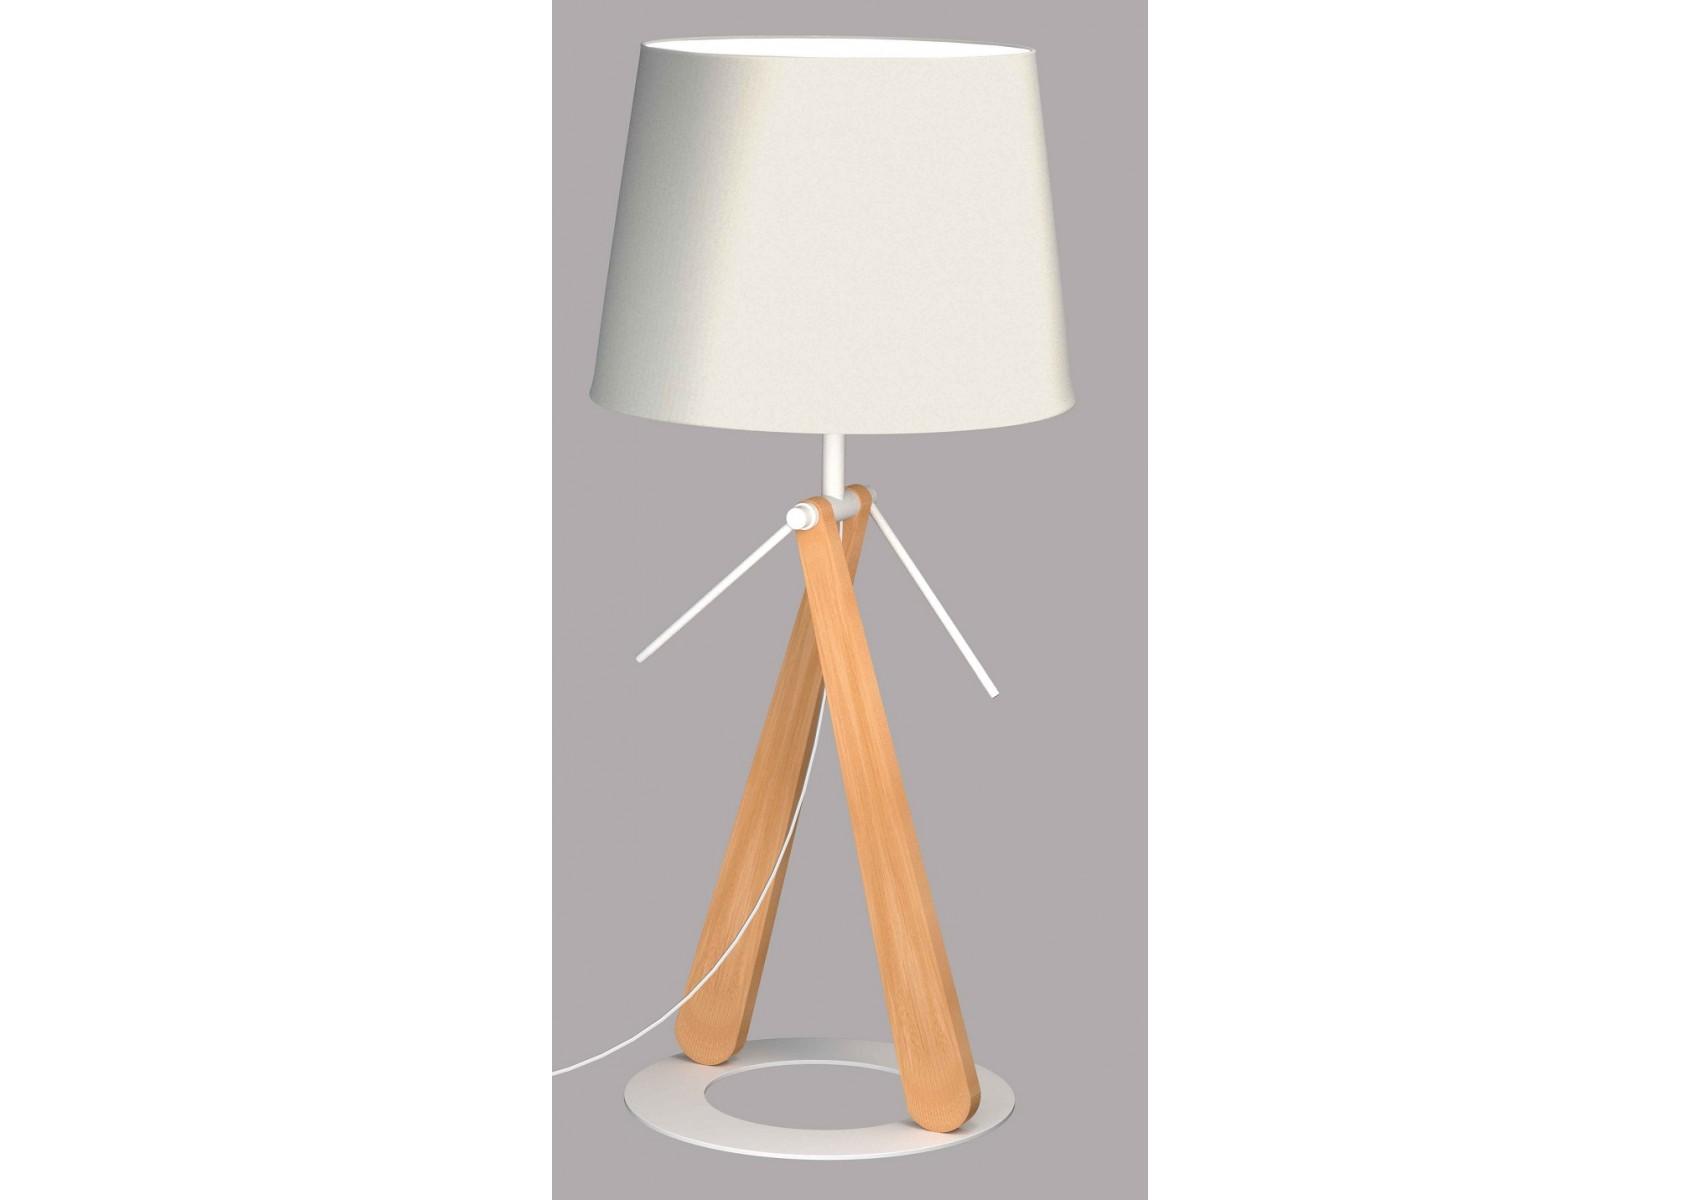 lampe aluminor grande lampe poser articule architecte ld sur tau aluminor lampe aluminor. Black Bedroom Furniture Sets. Home Design Ideas